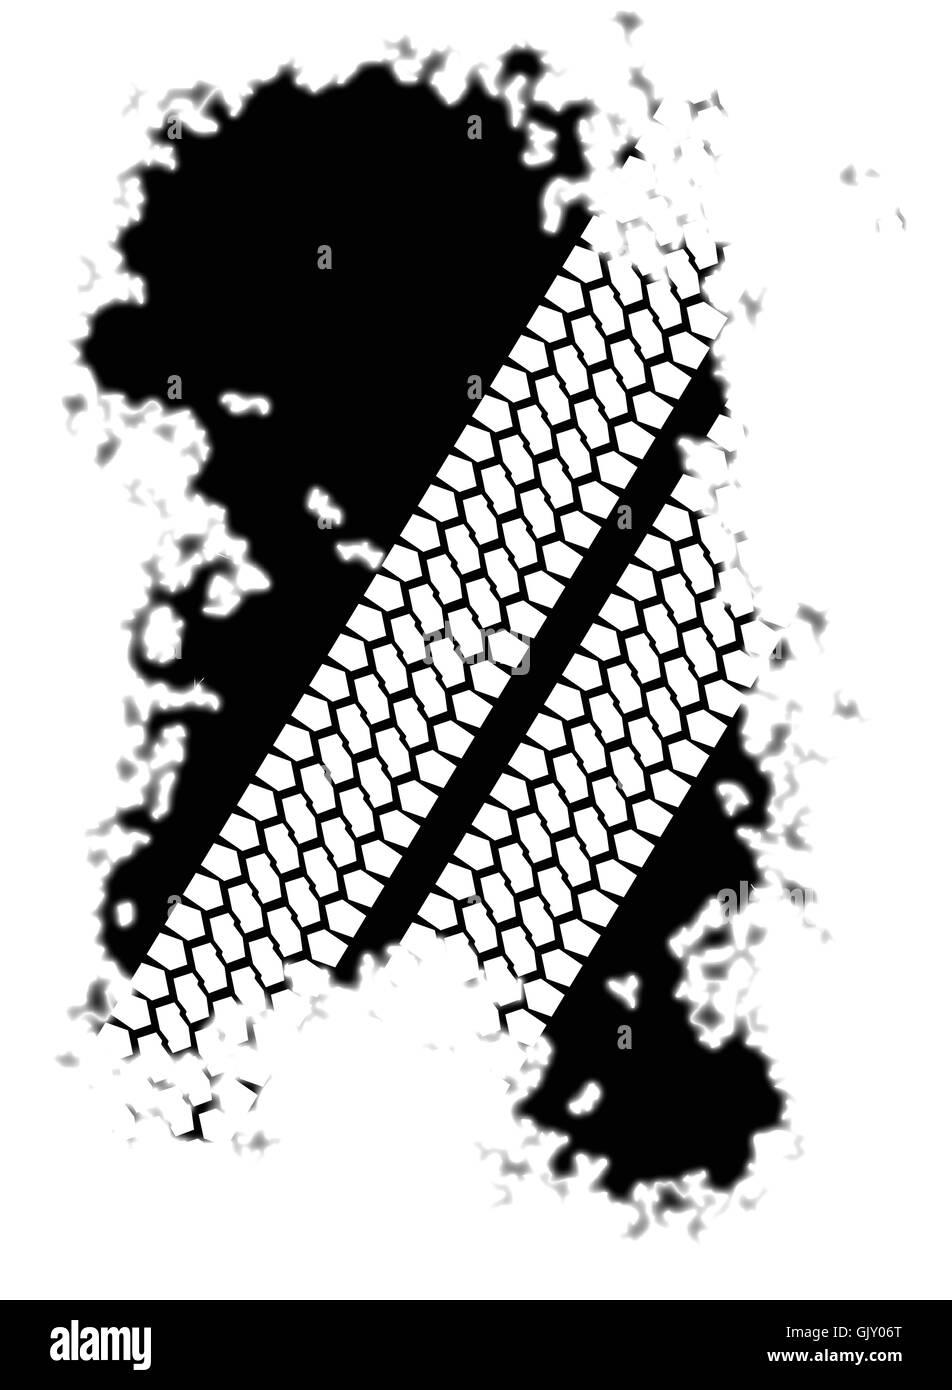 Tyre Tread Grunge - Stock Image